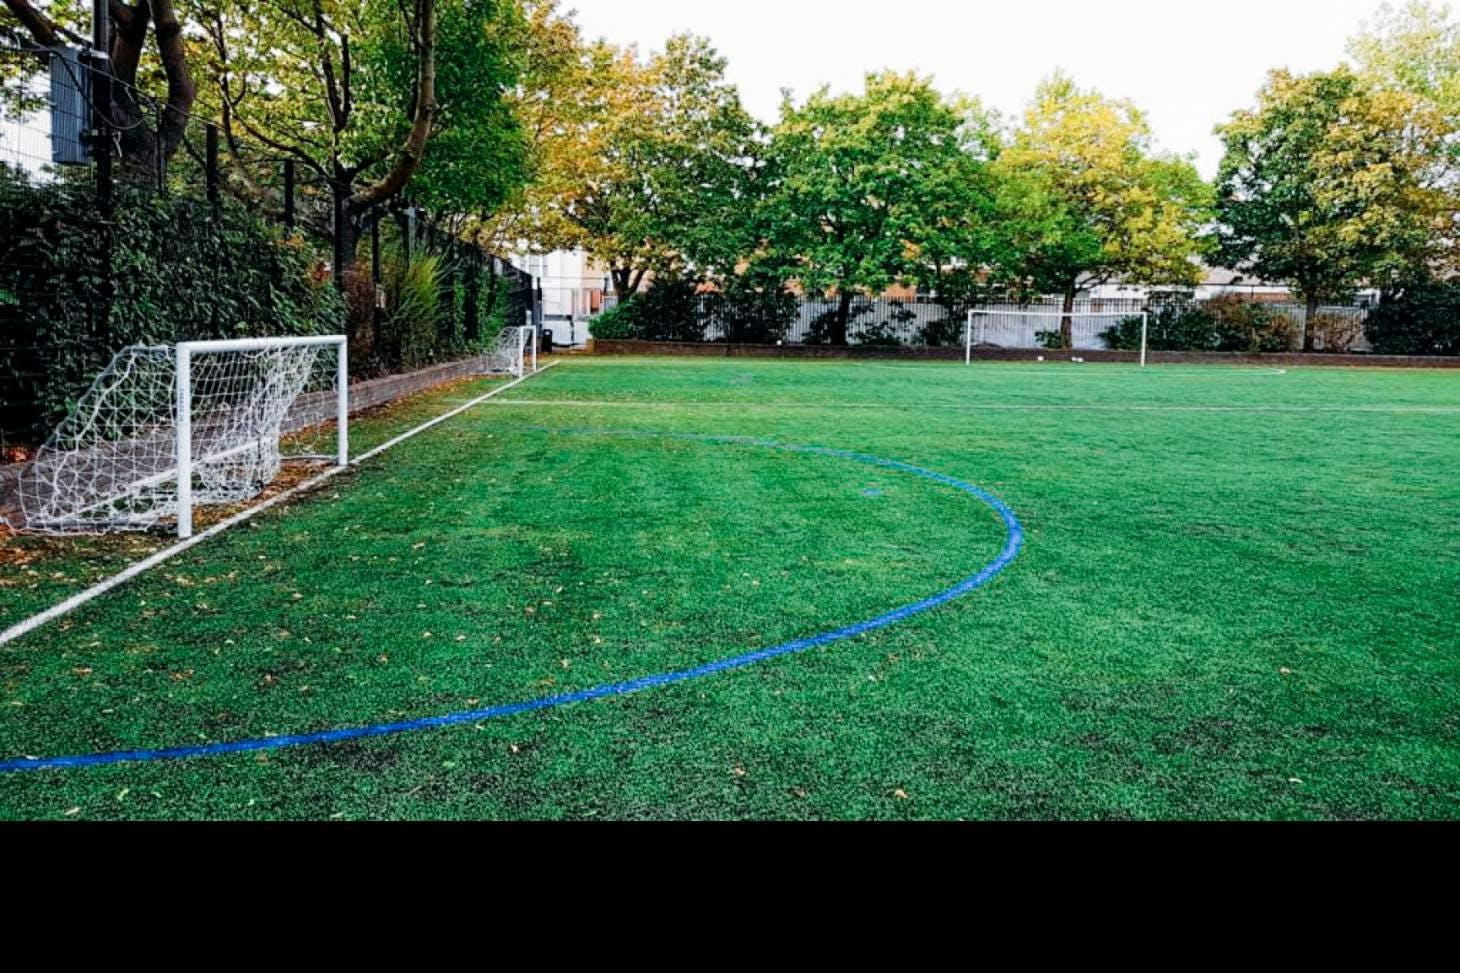 Harris Academy Battersea 5 a side | 3G Astroturf football pitch